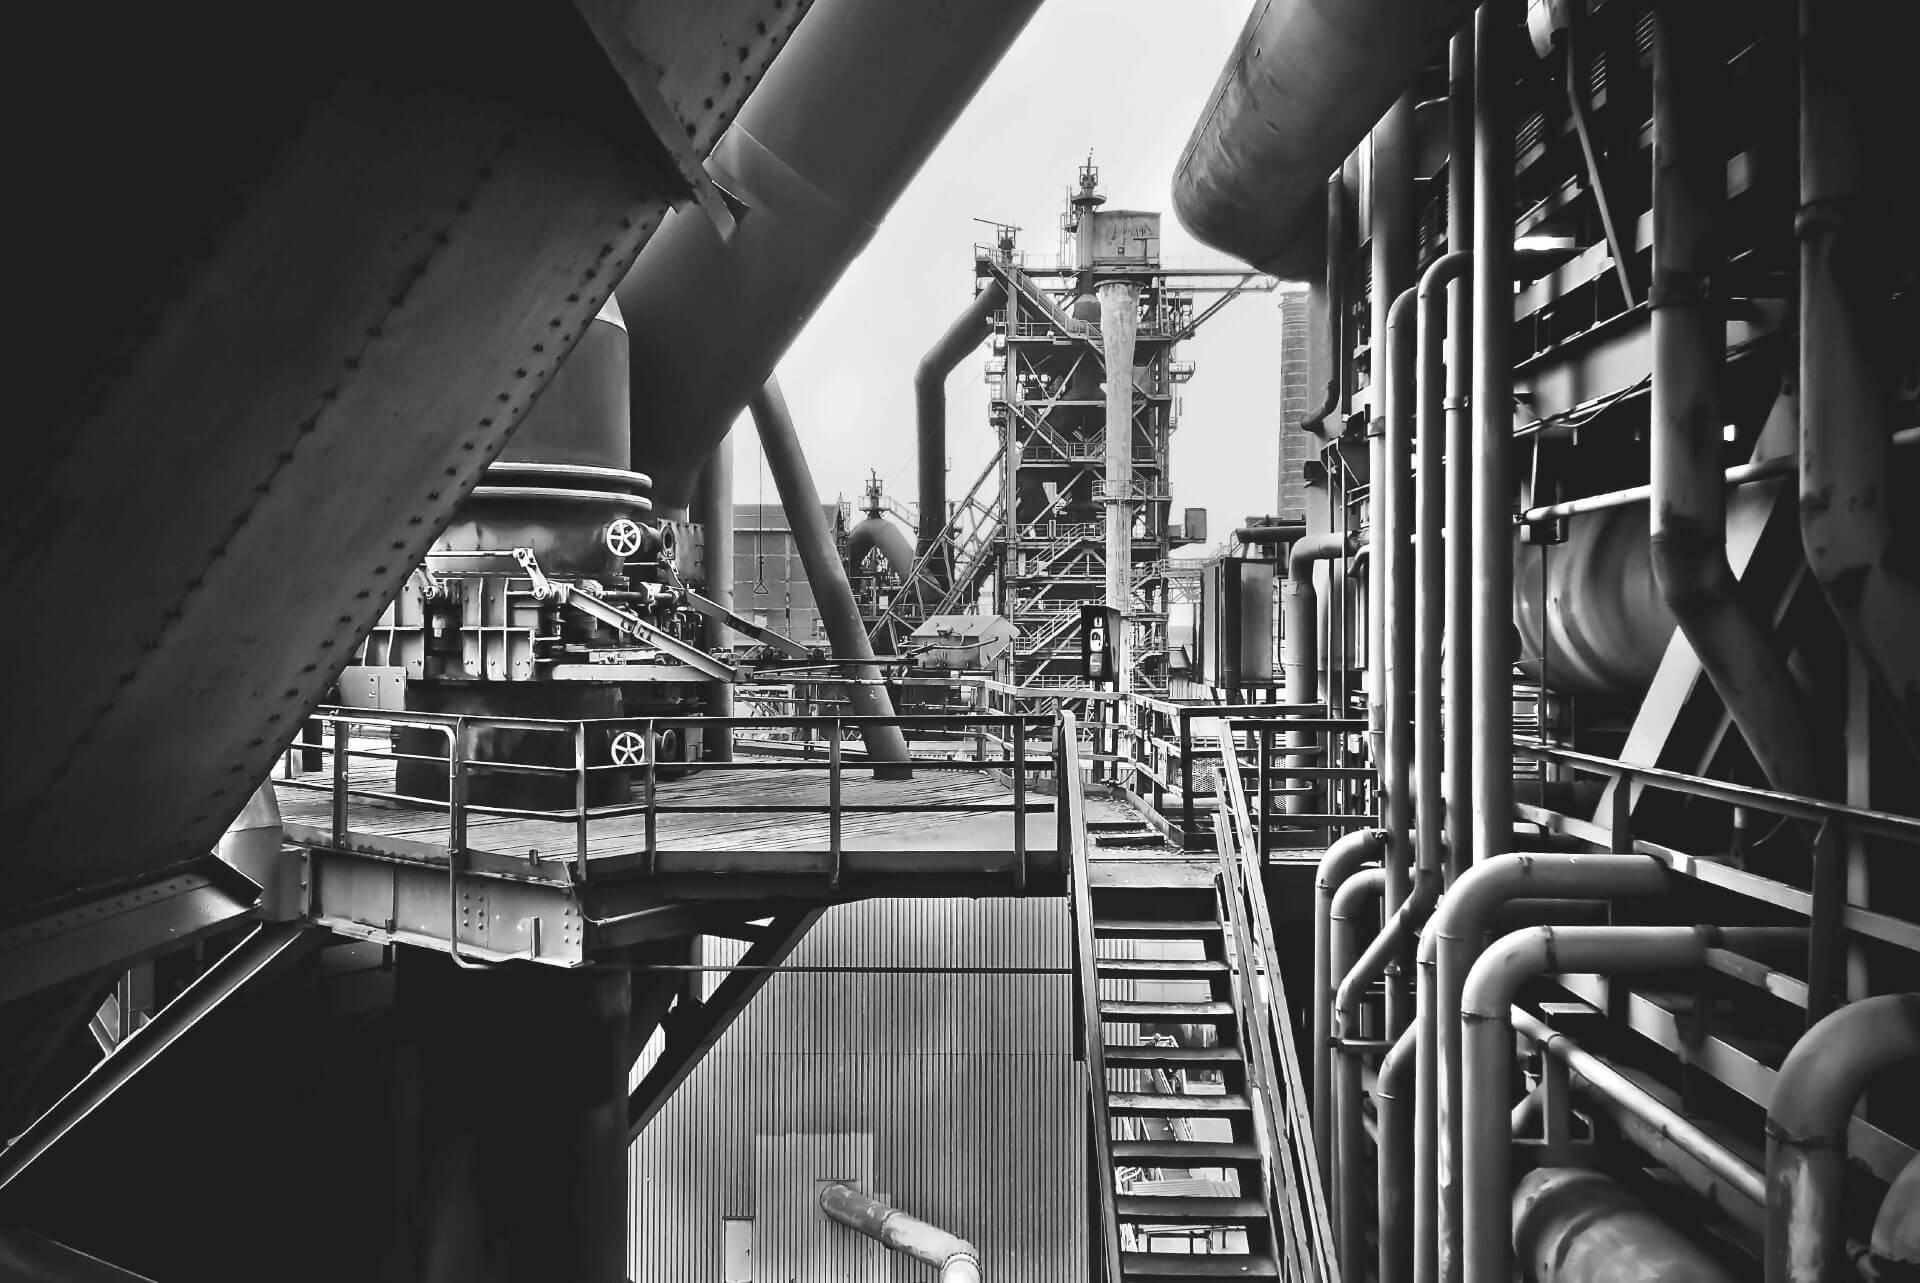 2g Bureau D Etude En Metallerie Pres De Pontcharra A Sainte